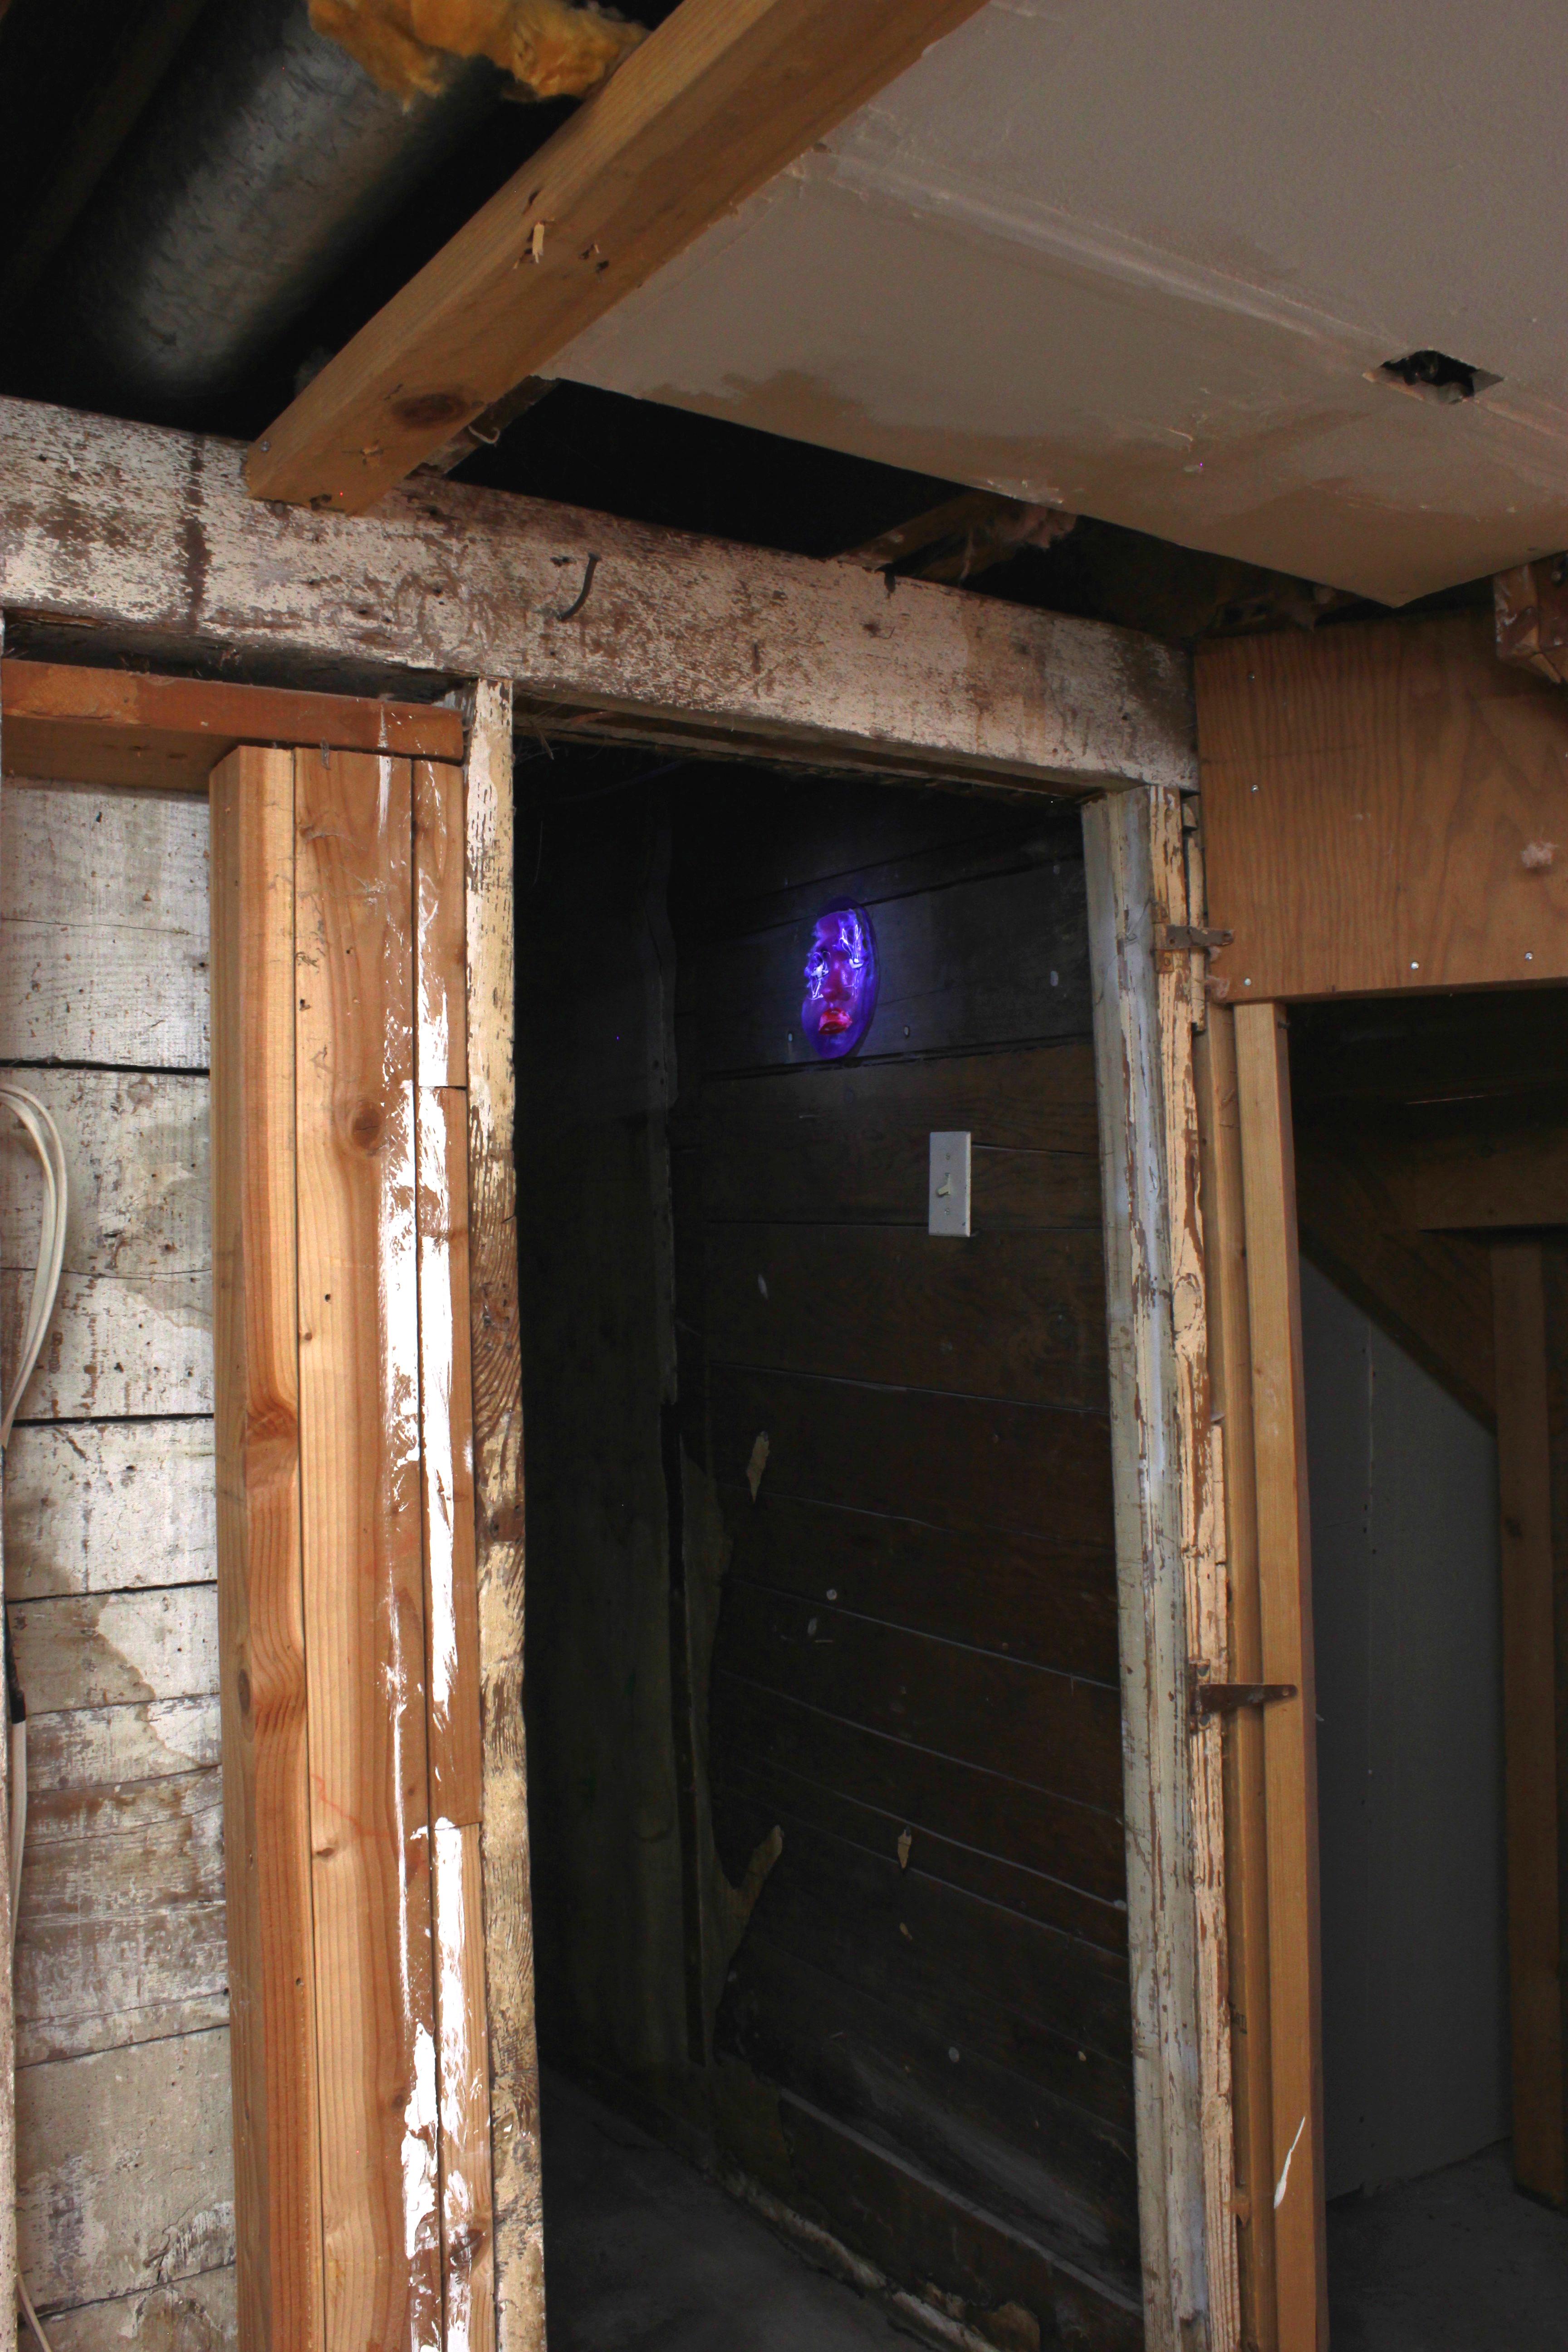 012-installation-view-lucia-leuci-cupids-clearasil